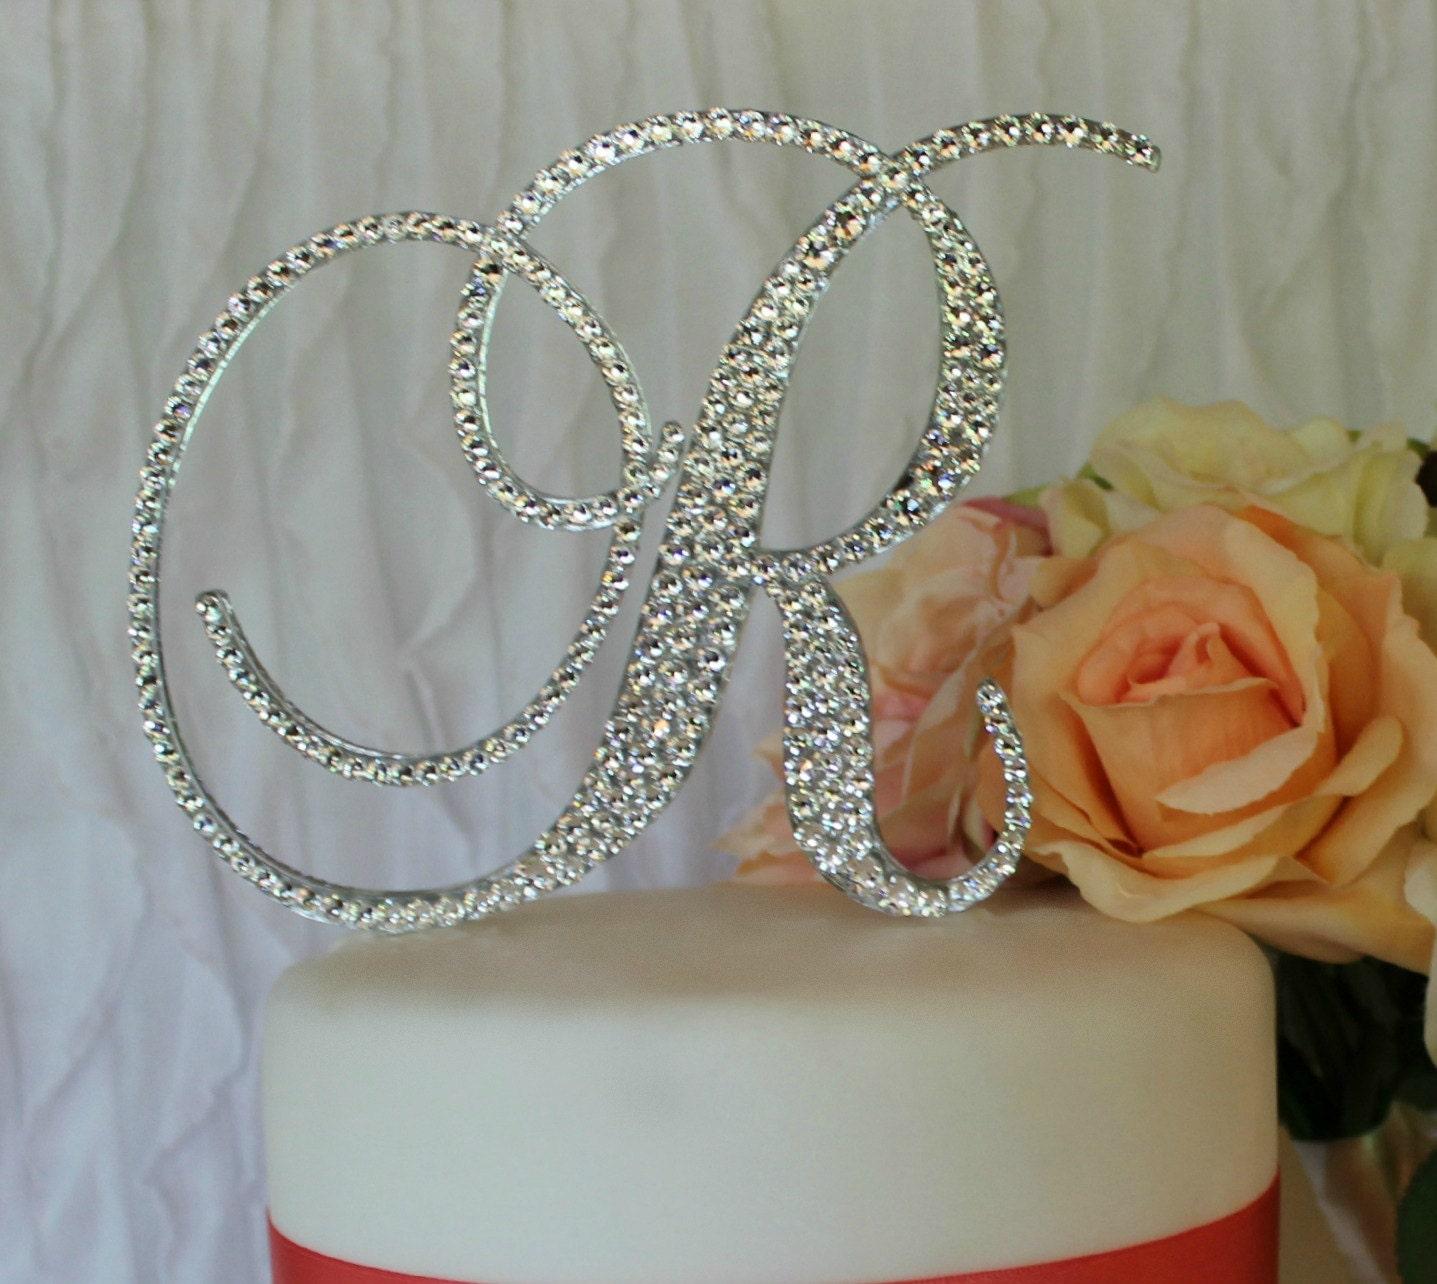 5 Monogram Wedding Cake Topper with Swarovski Crystals